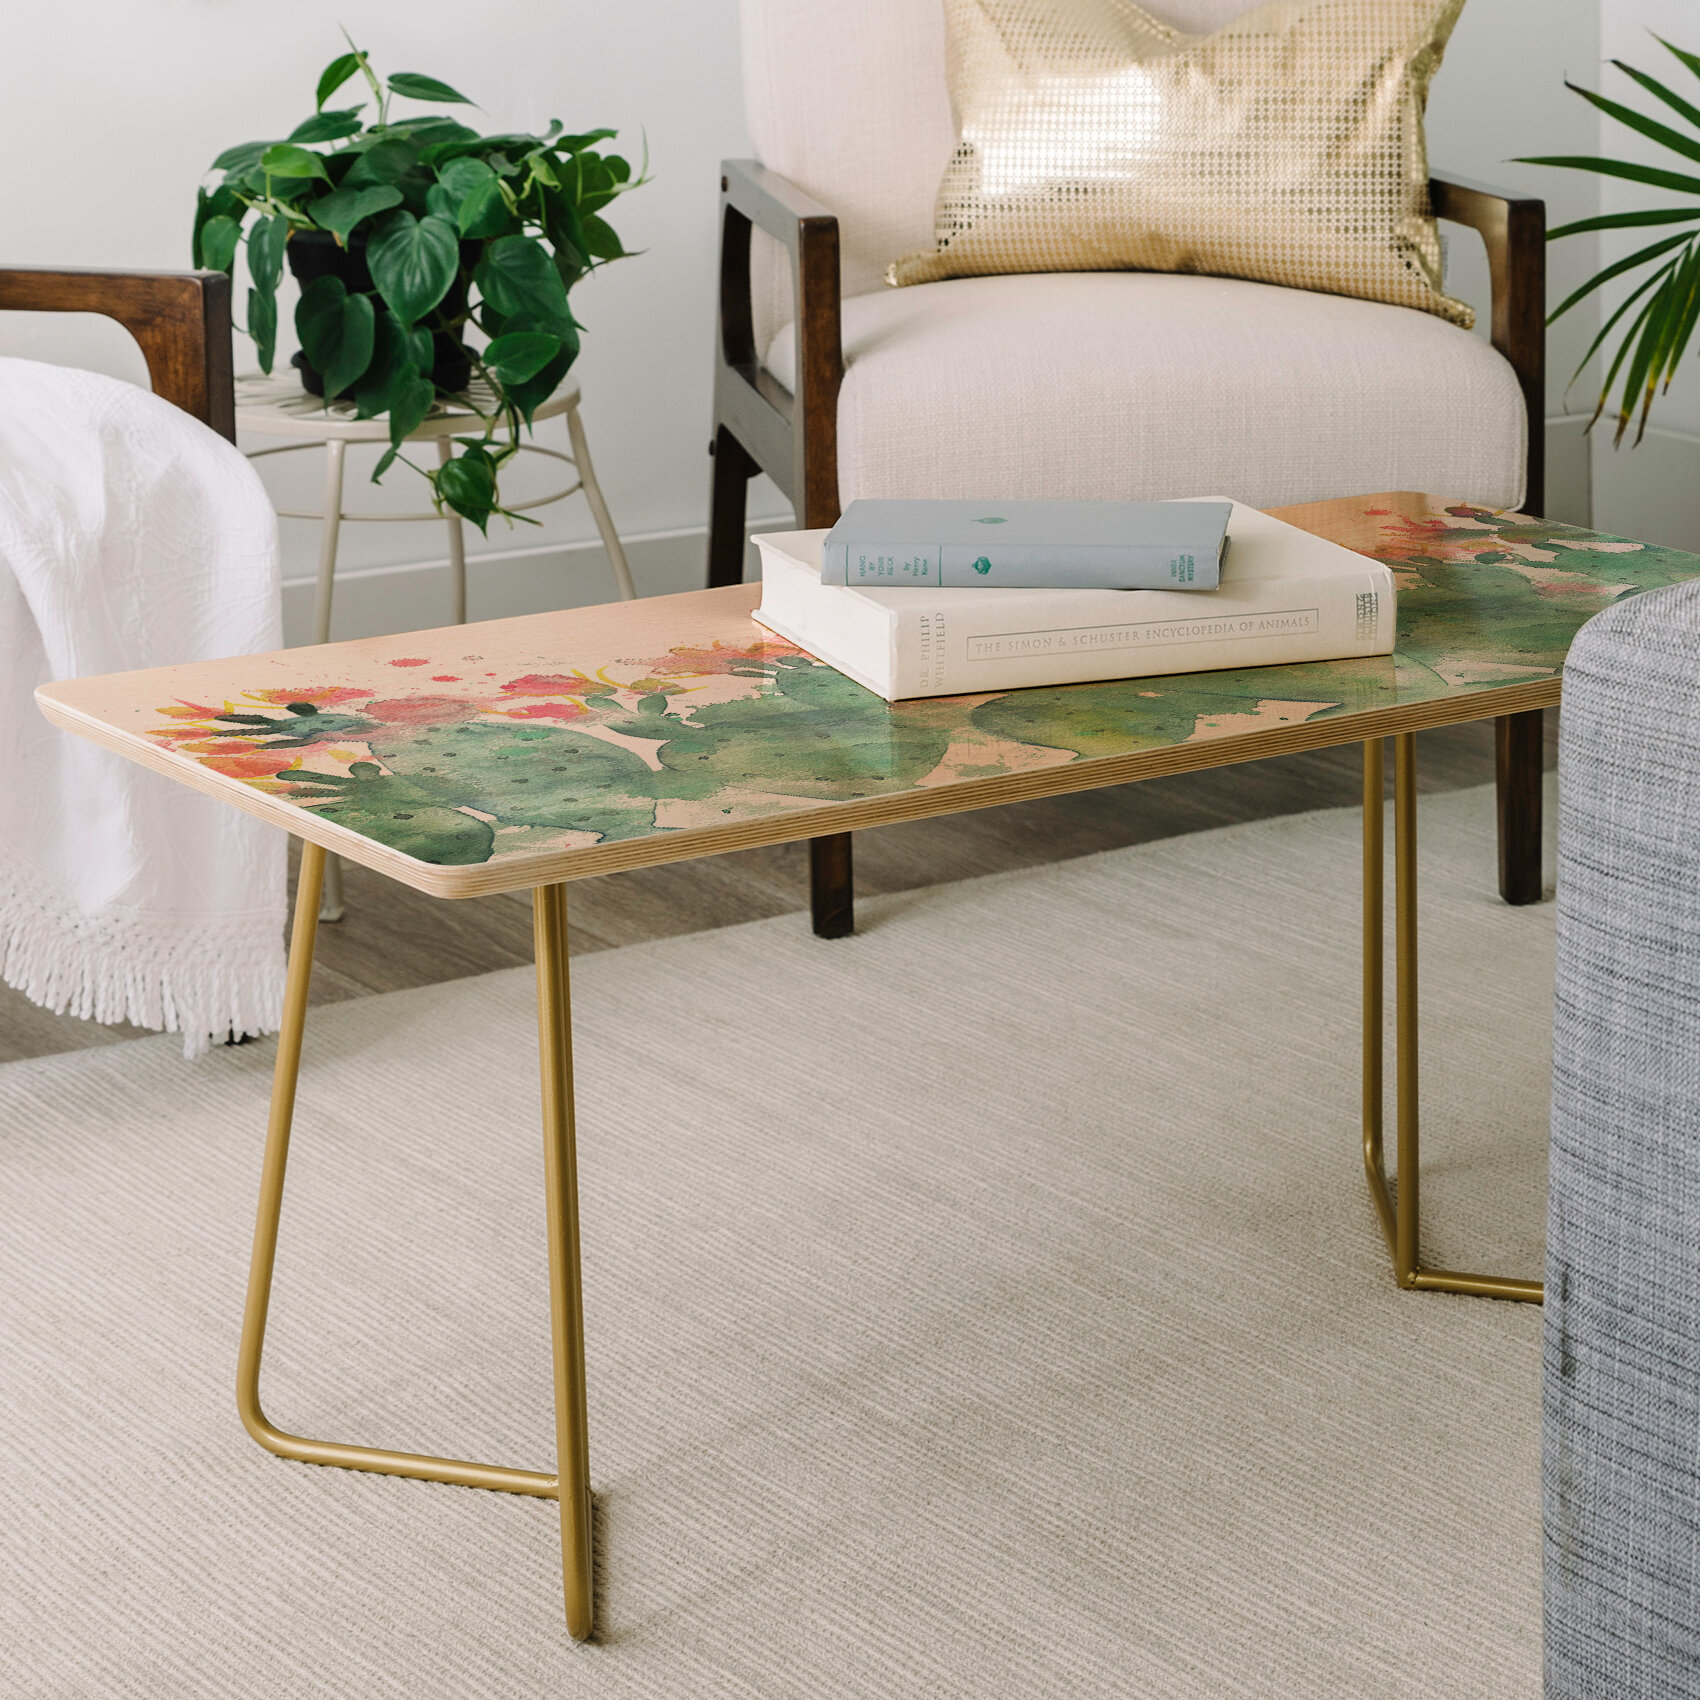 East urban home dash and ash messy cactus coffee table wayfair